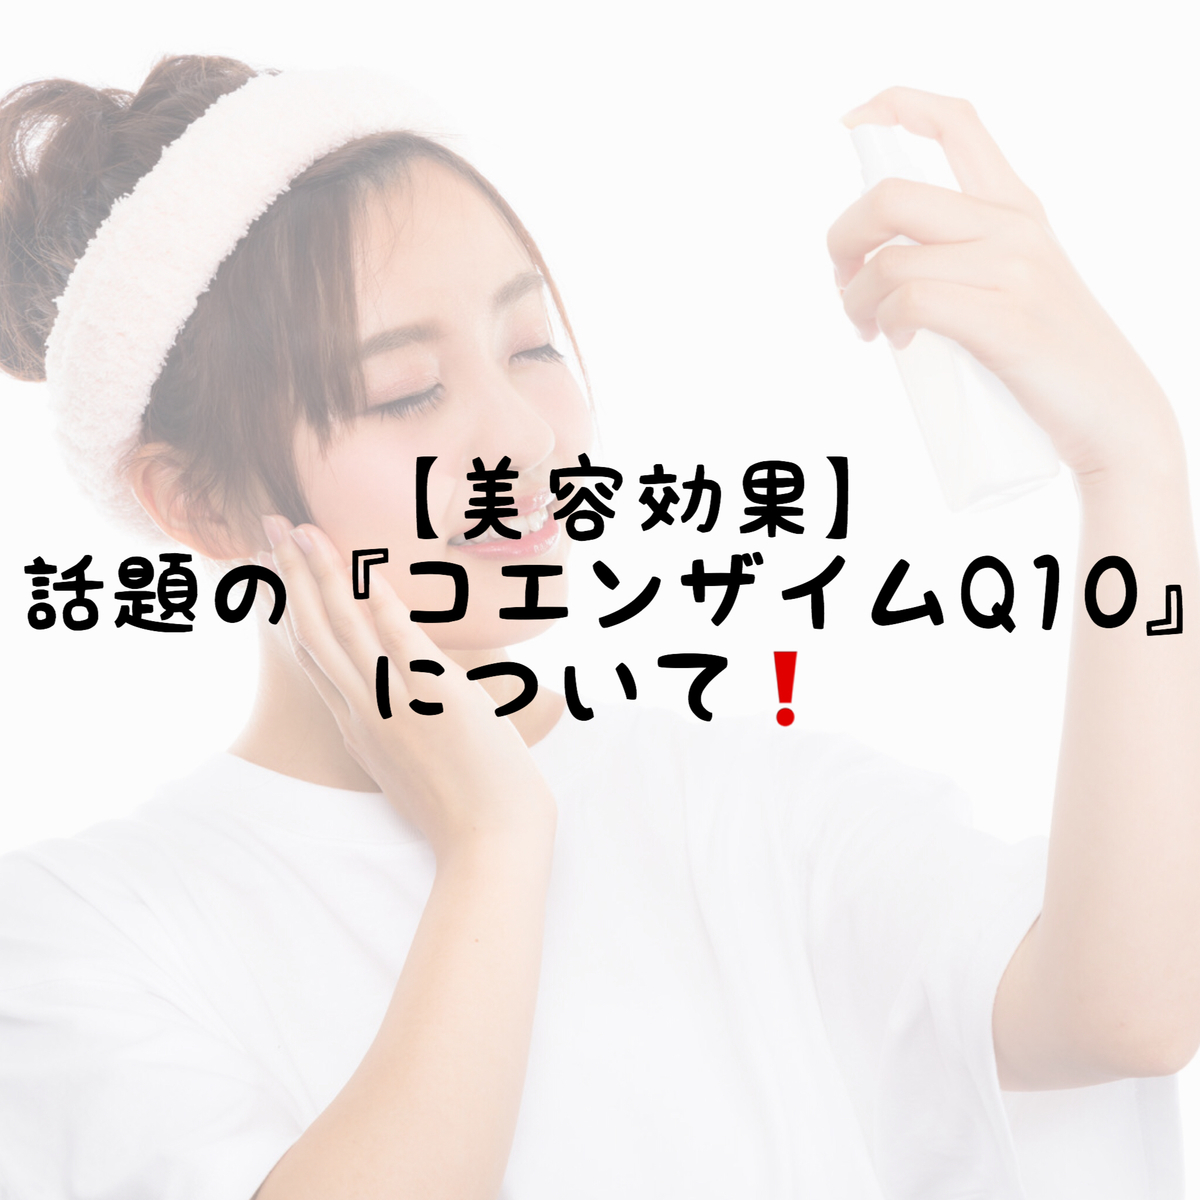 f:id:nokonoko_o:20200519134233j:plain